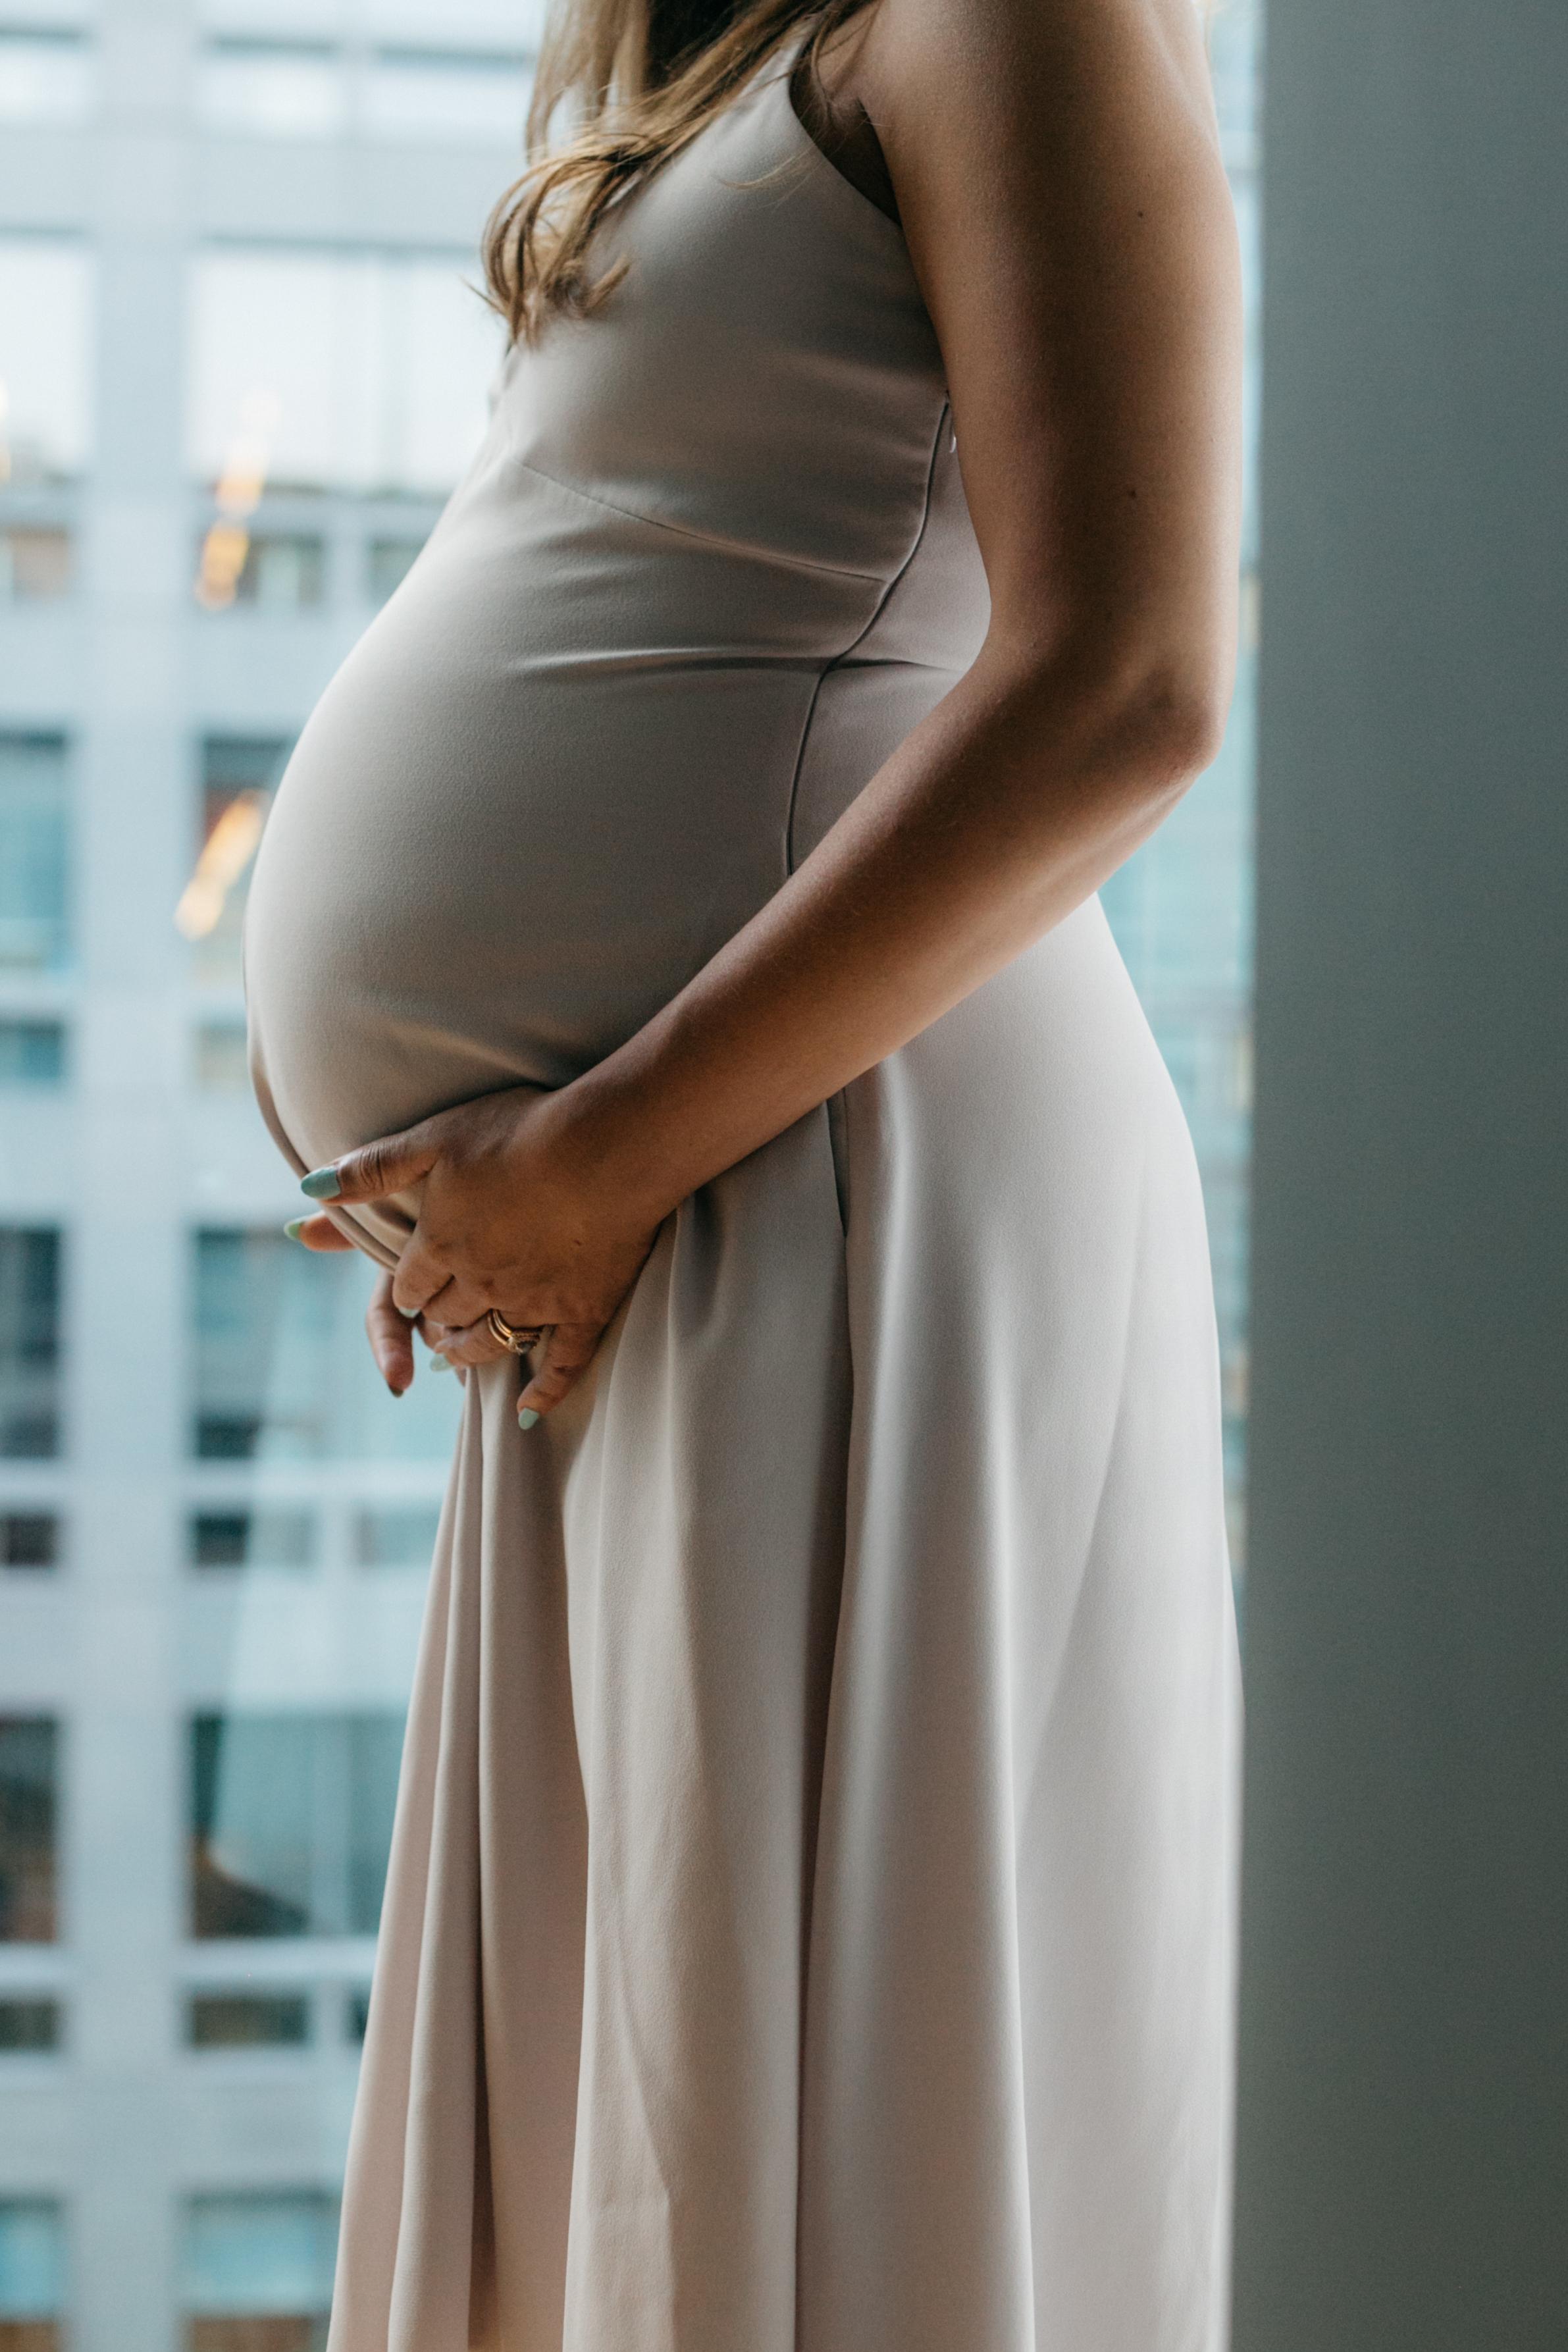 Mariam_Drew_Maternity-23.jpg